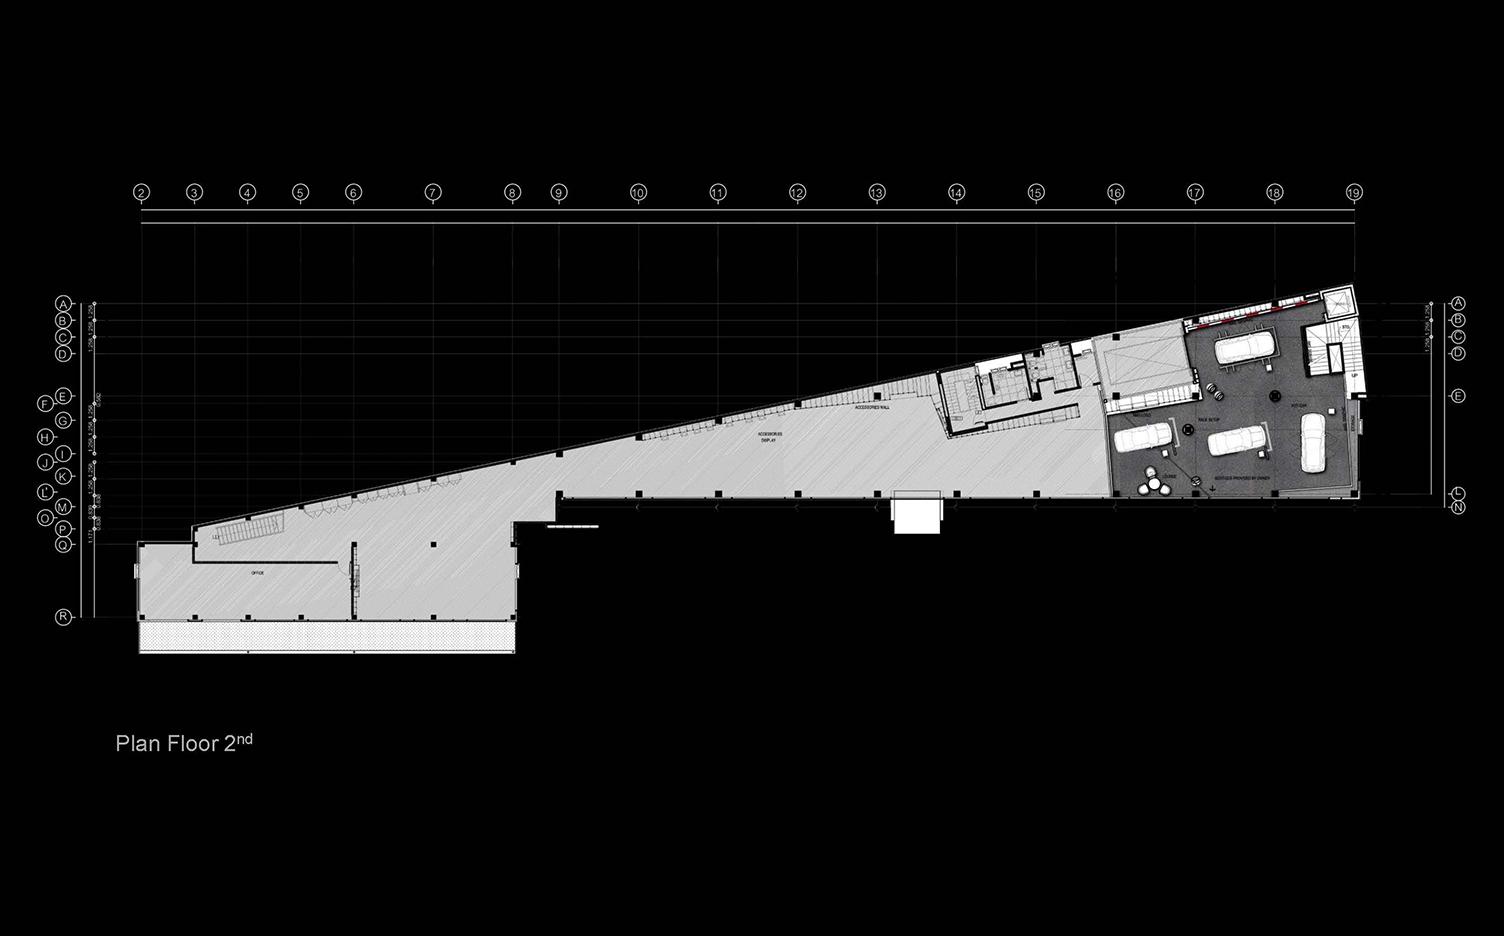 amg performance mercedes benz design 03.